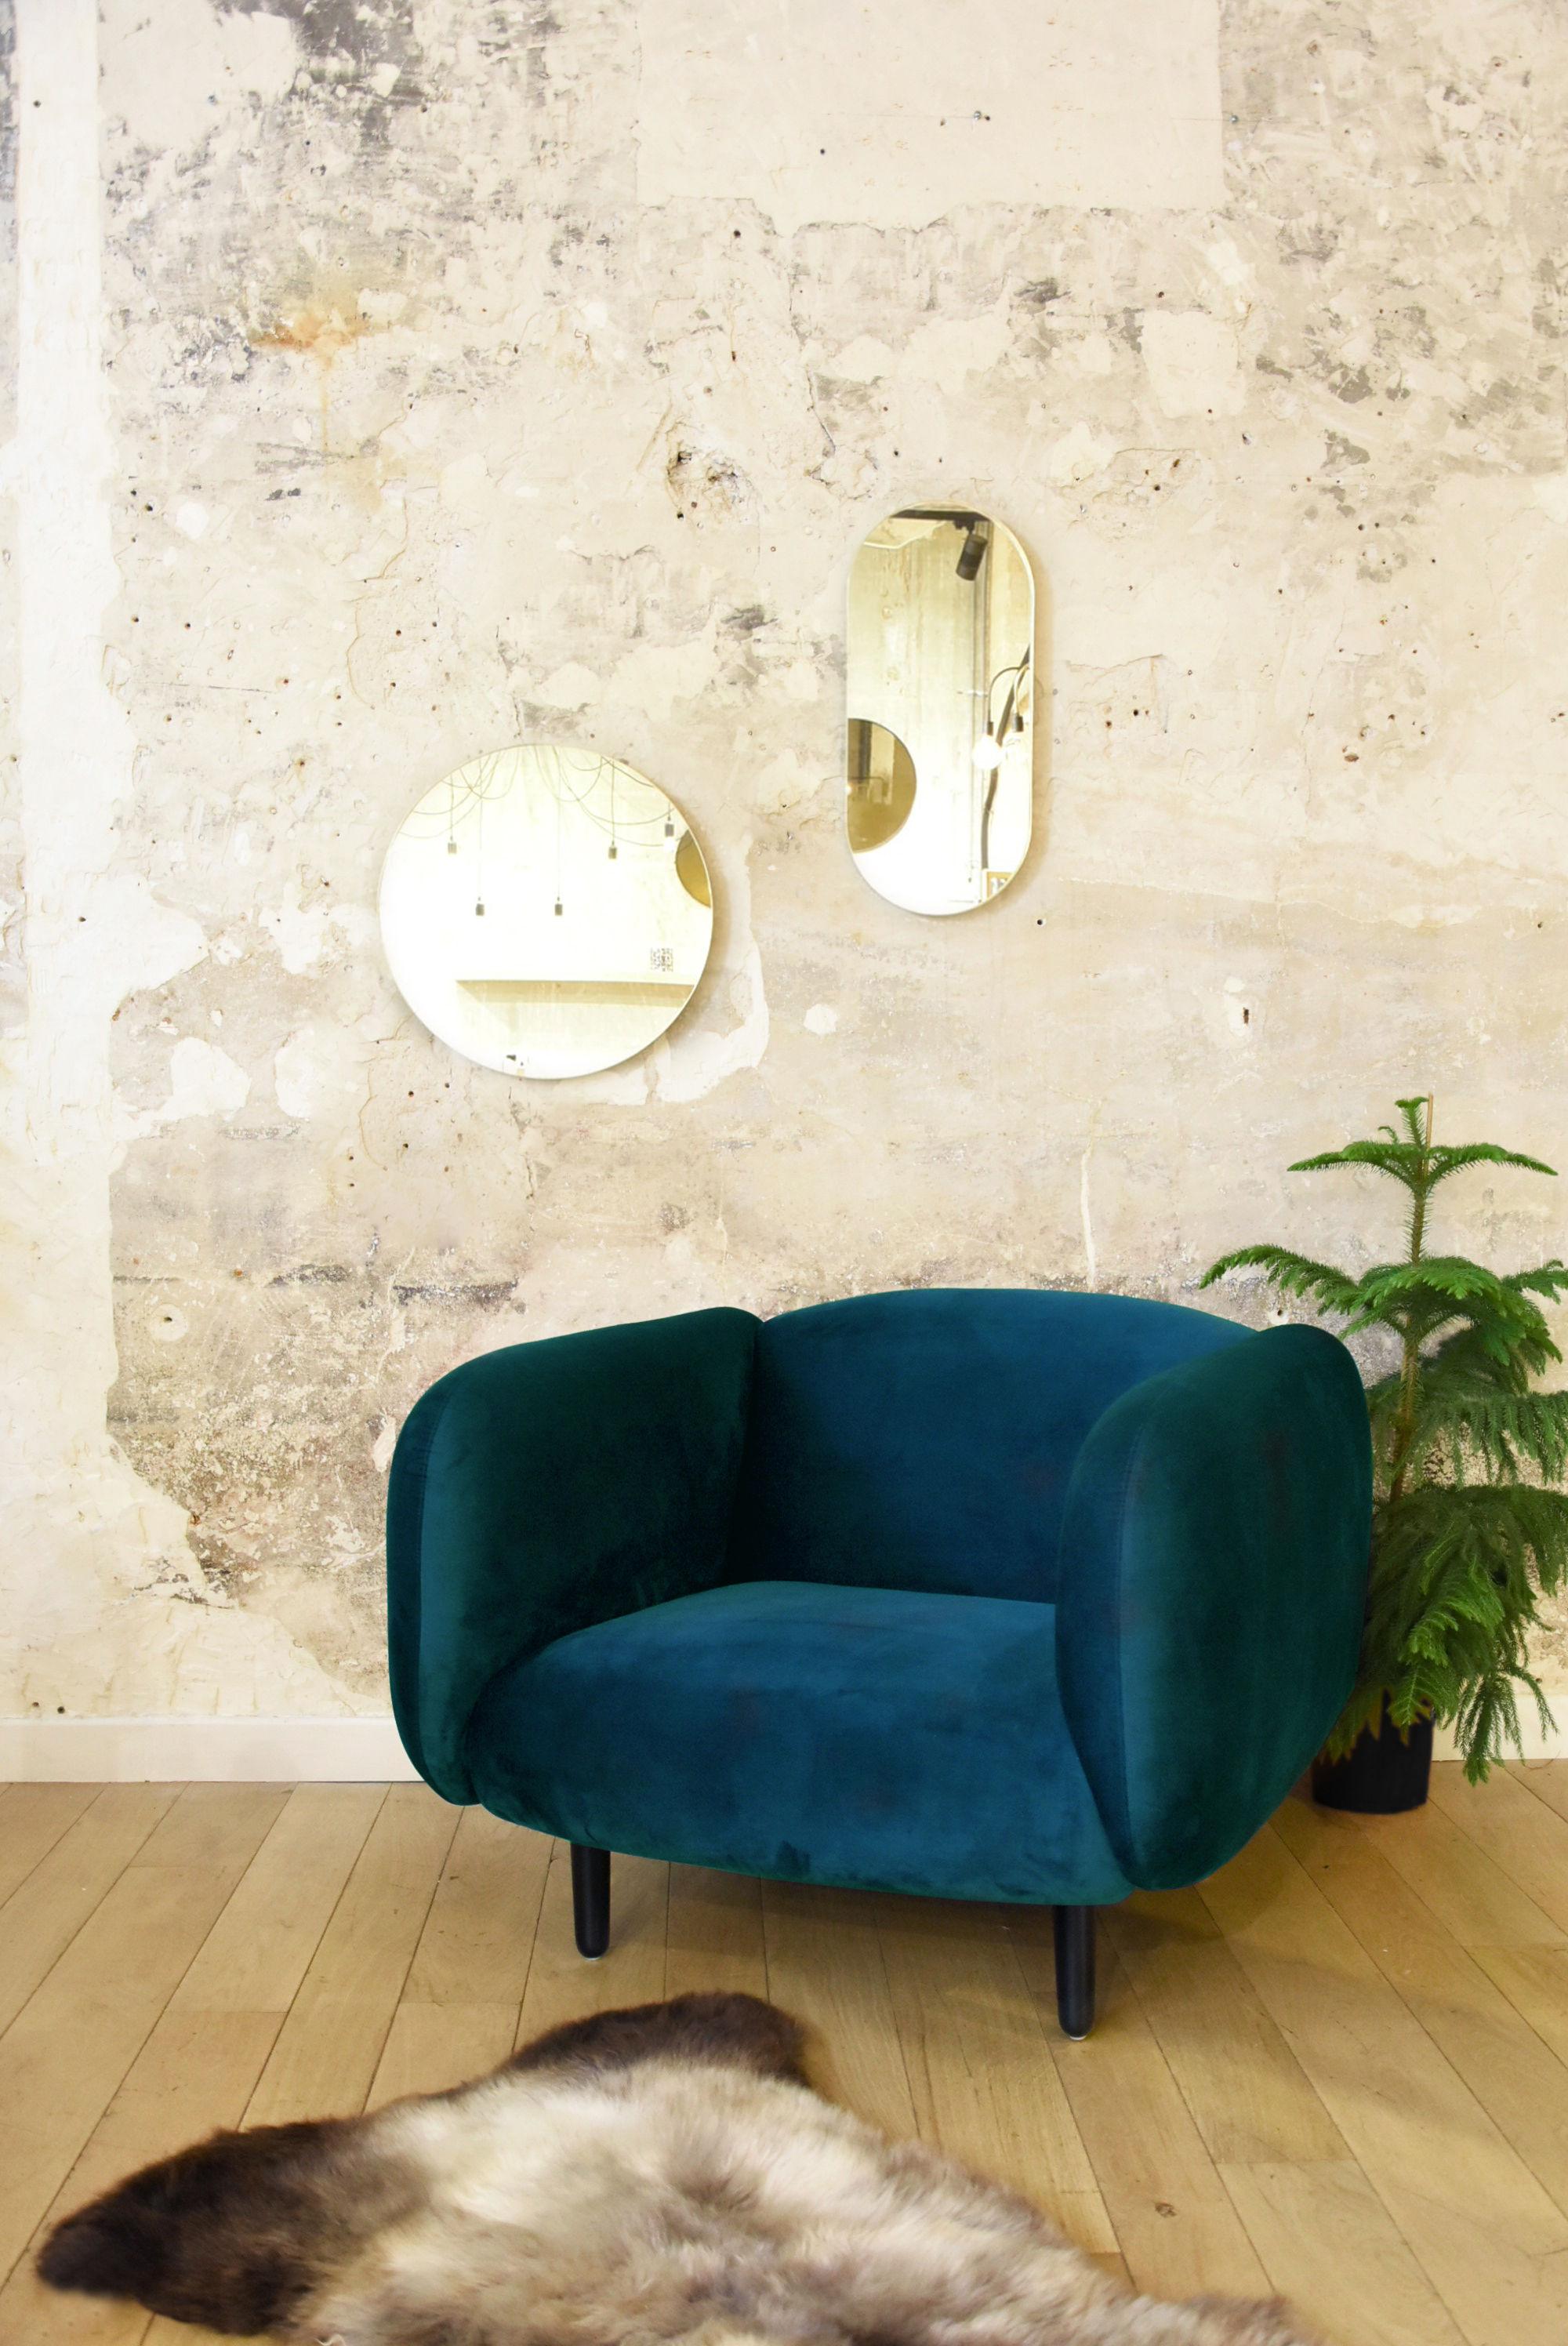 fauteuil rembourr mo ra velours velours vert canard enostudio. Black Bedroom Furniture Sets. Home Design Ideas